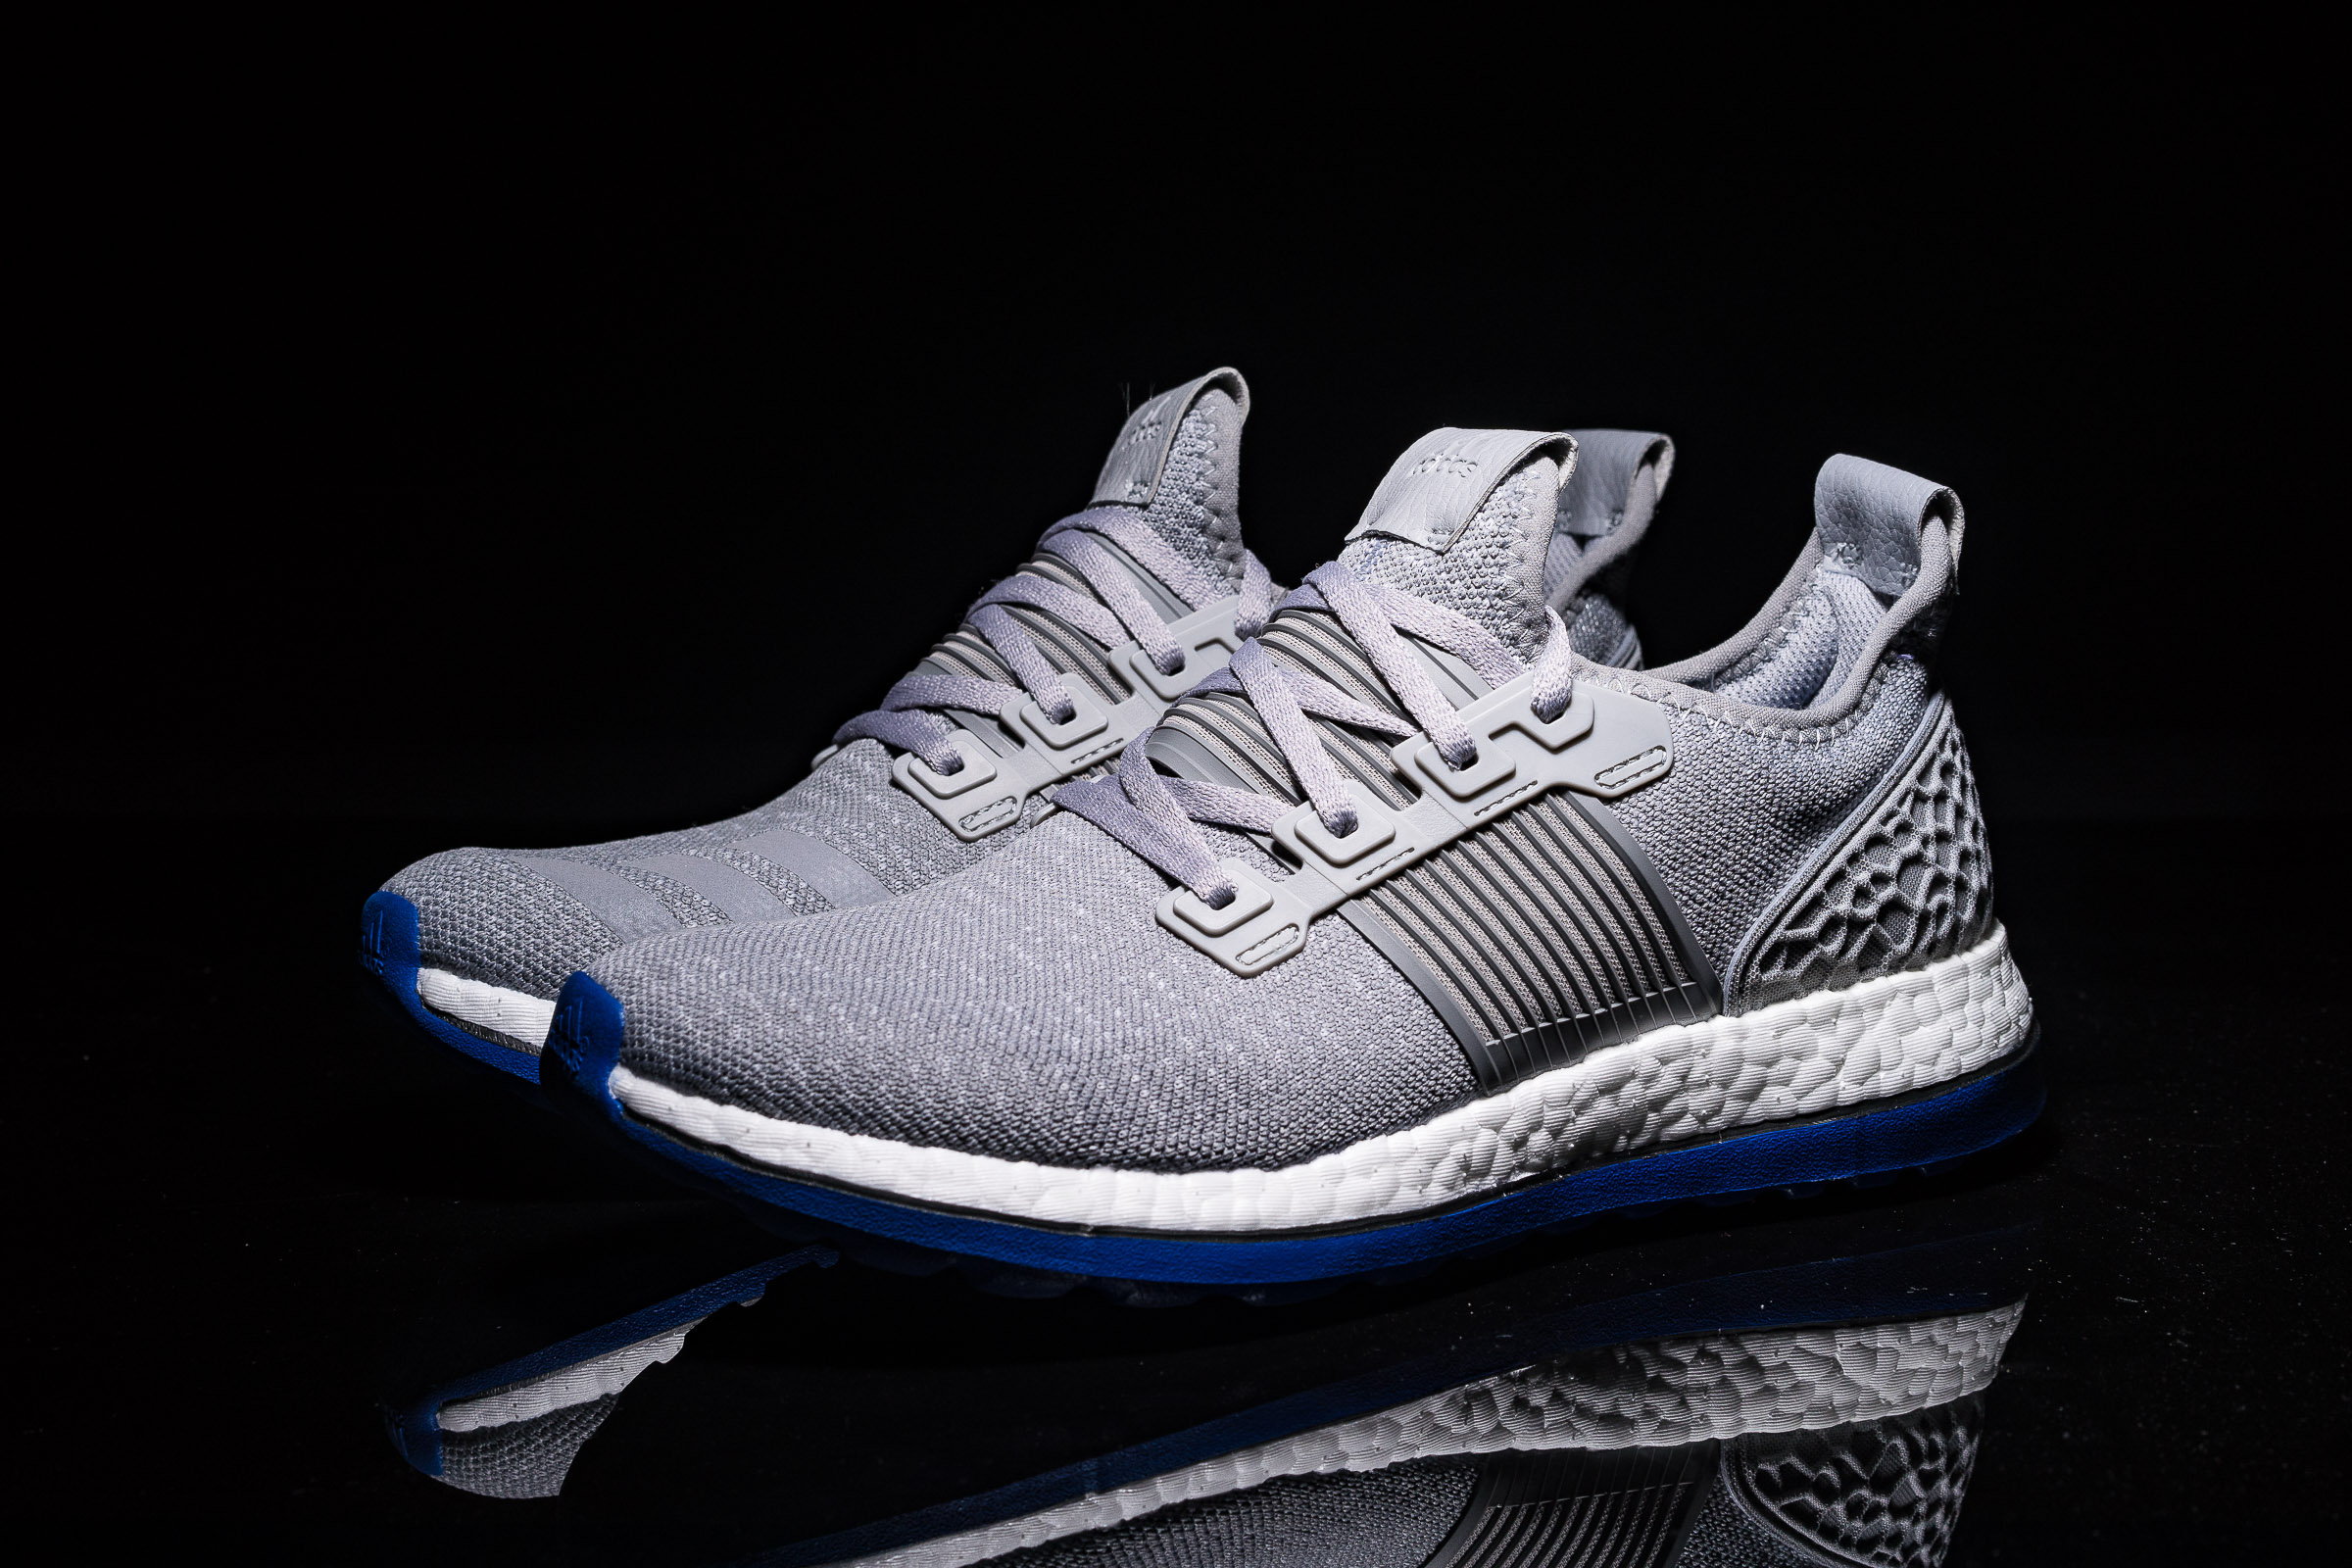 Adidas Pureboost Zg Prime Feature 14 Kenlu Net